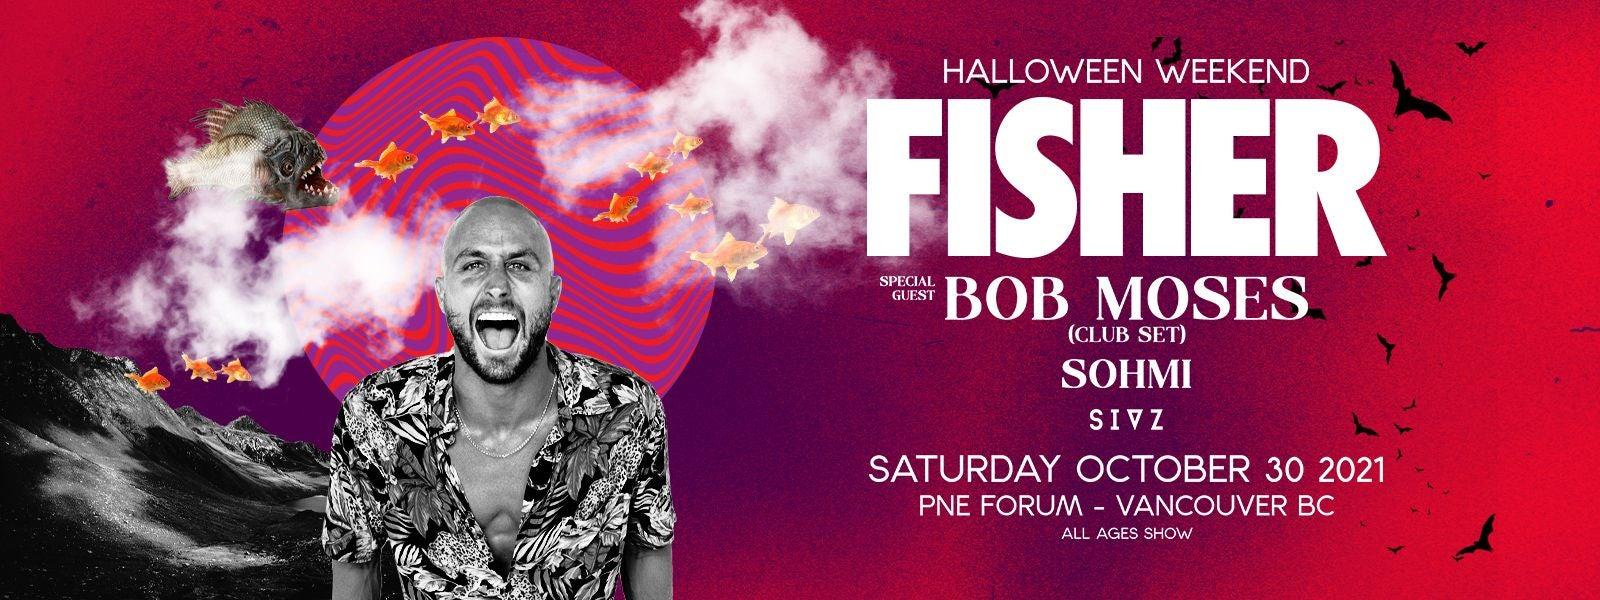 Fisher w/ Bob Moses and Sohmi